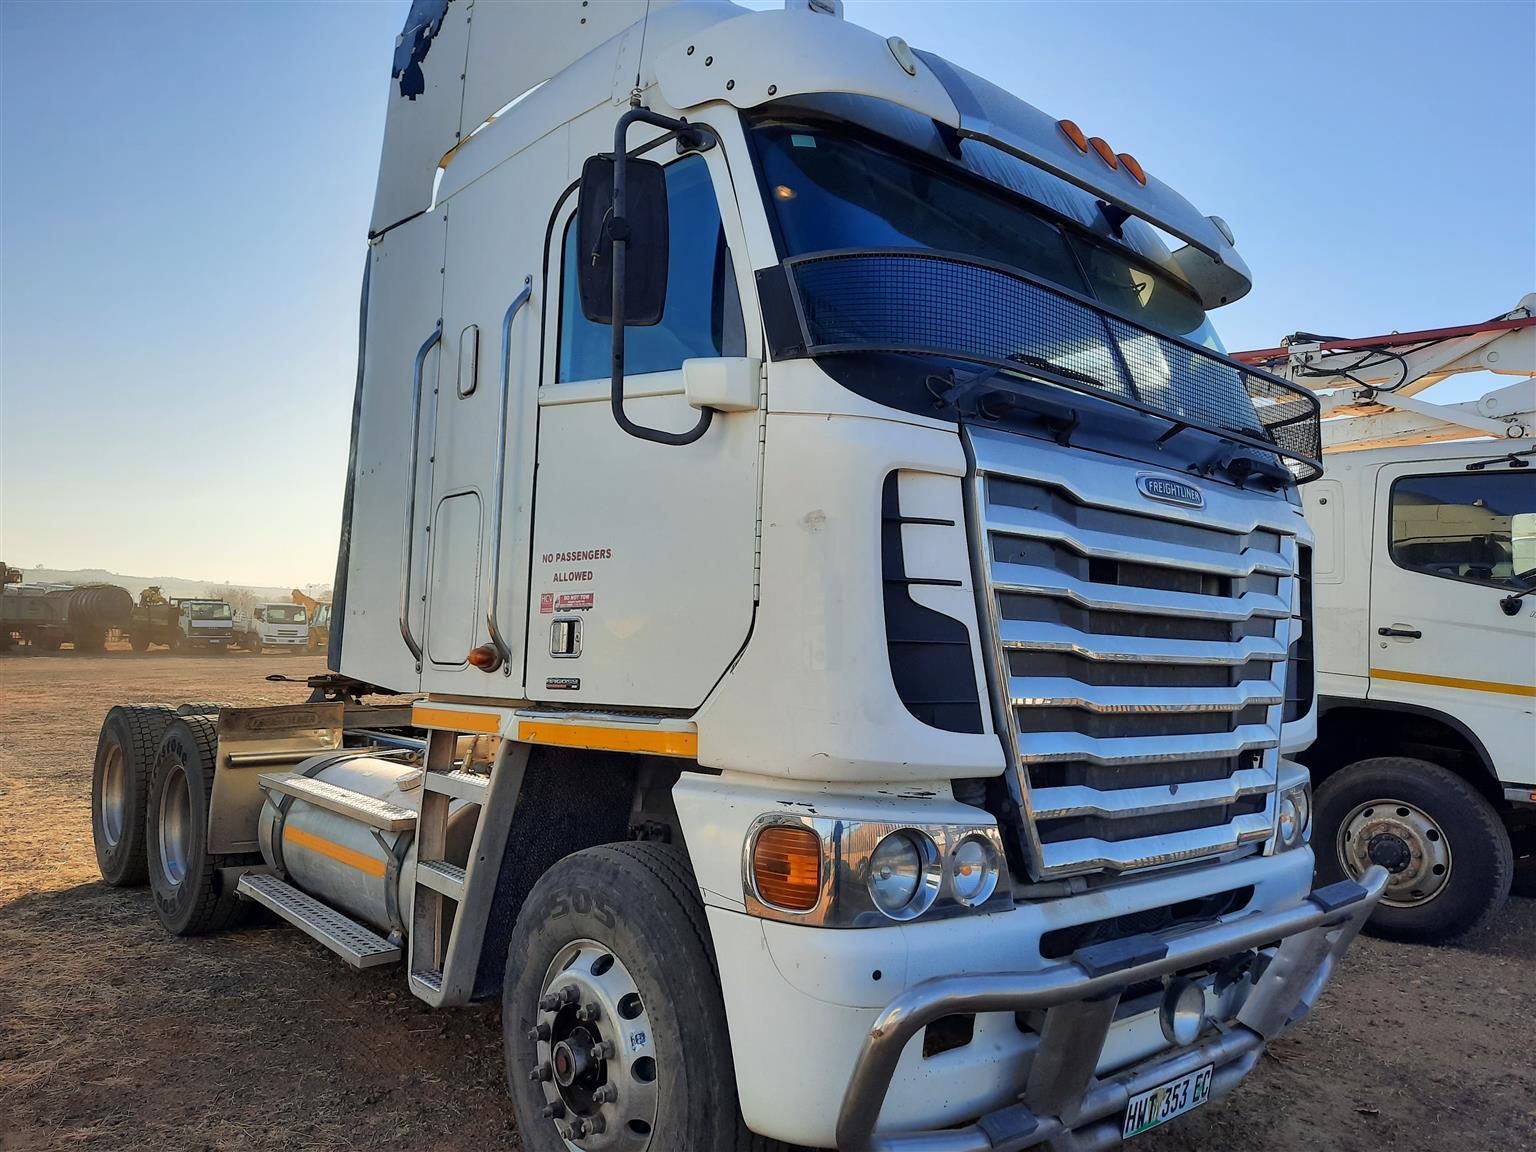 2013 Freightliner ISX 500 D/D truck 6x4